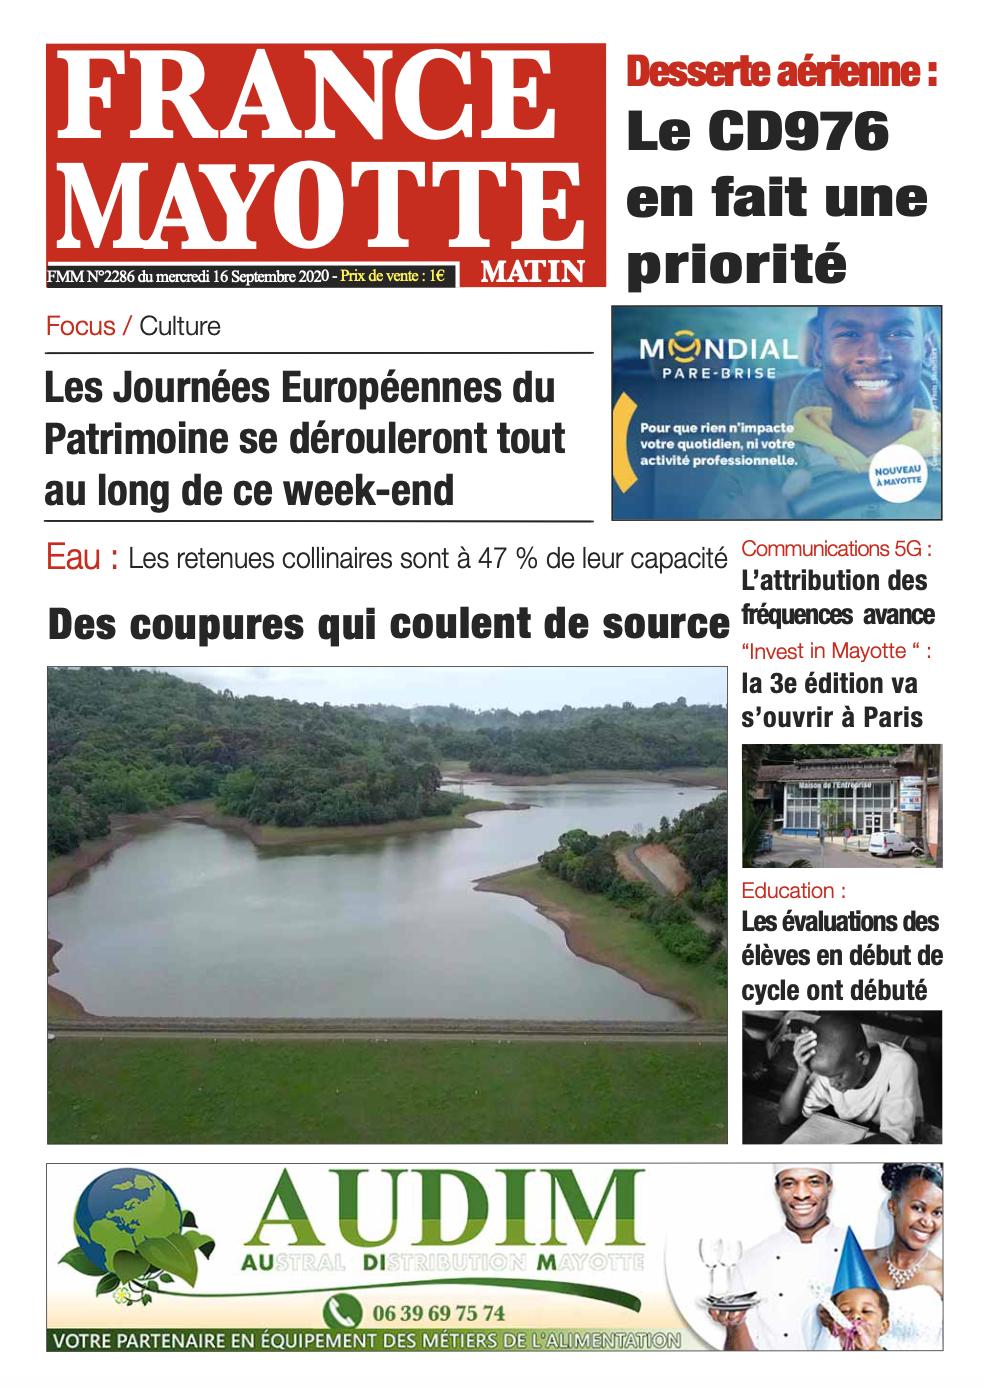 France Mayotte Mercredi 16 septembre 2020